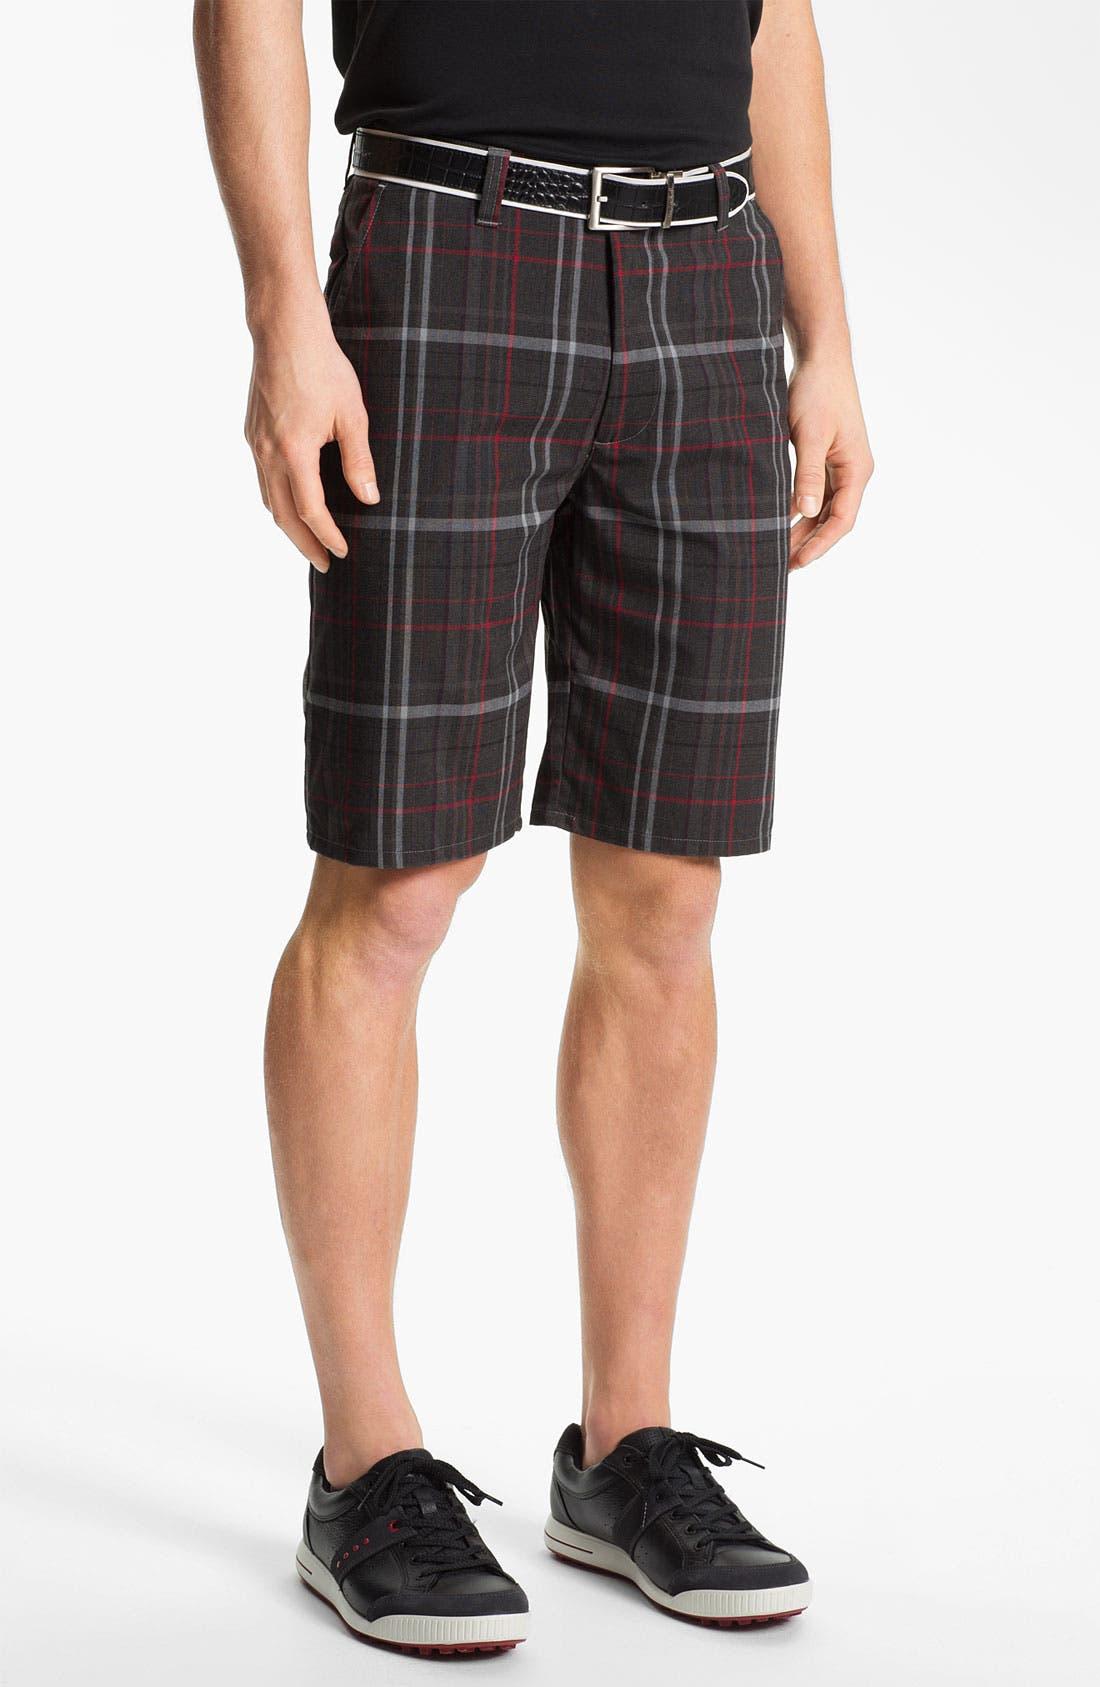 Alternate Image 1 Selected - Travis Mathew 'Darwin' Flat Front Golf Shorts